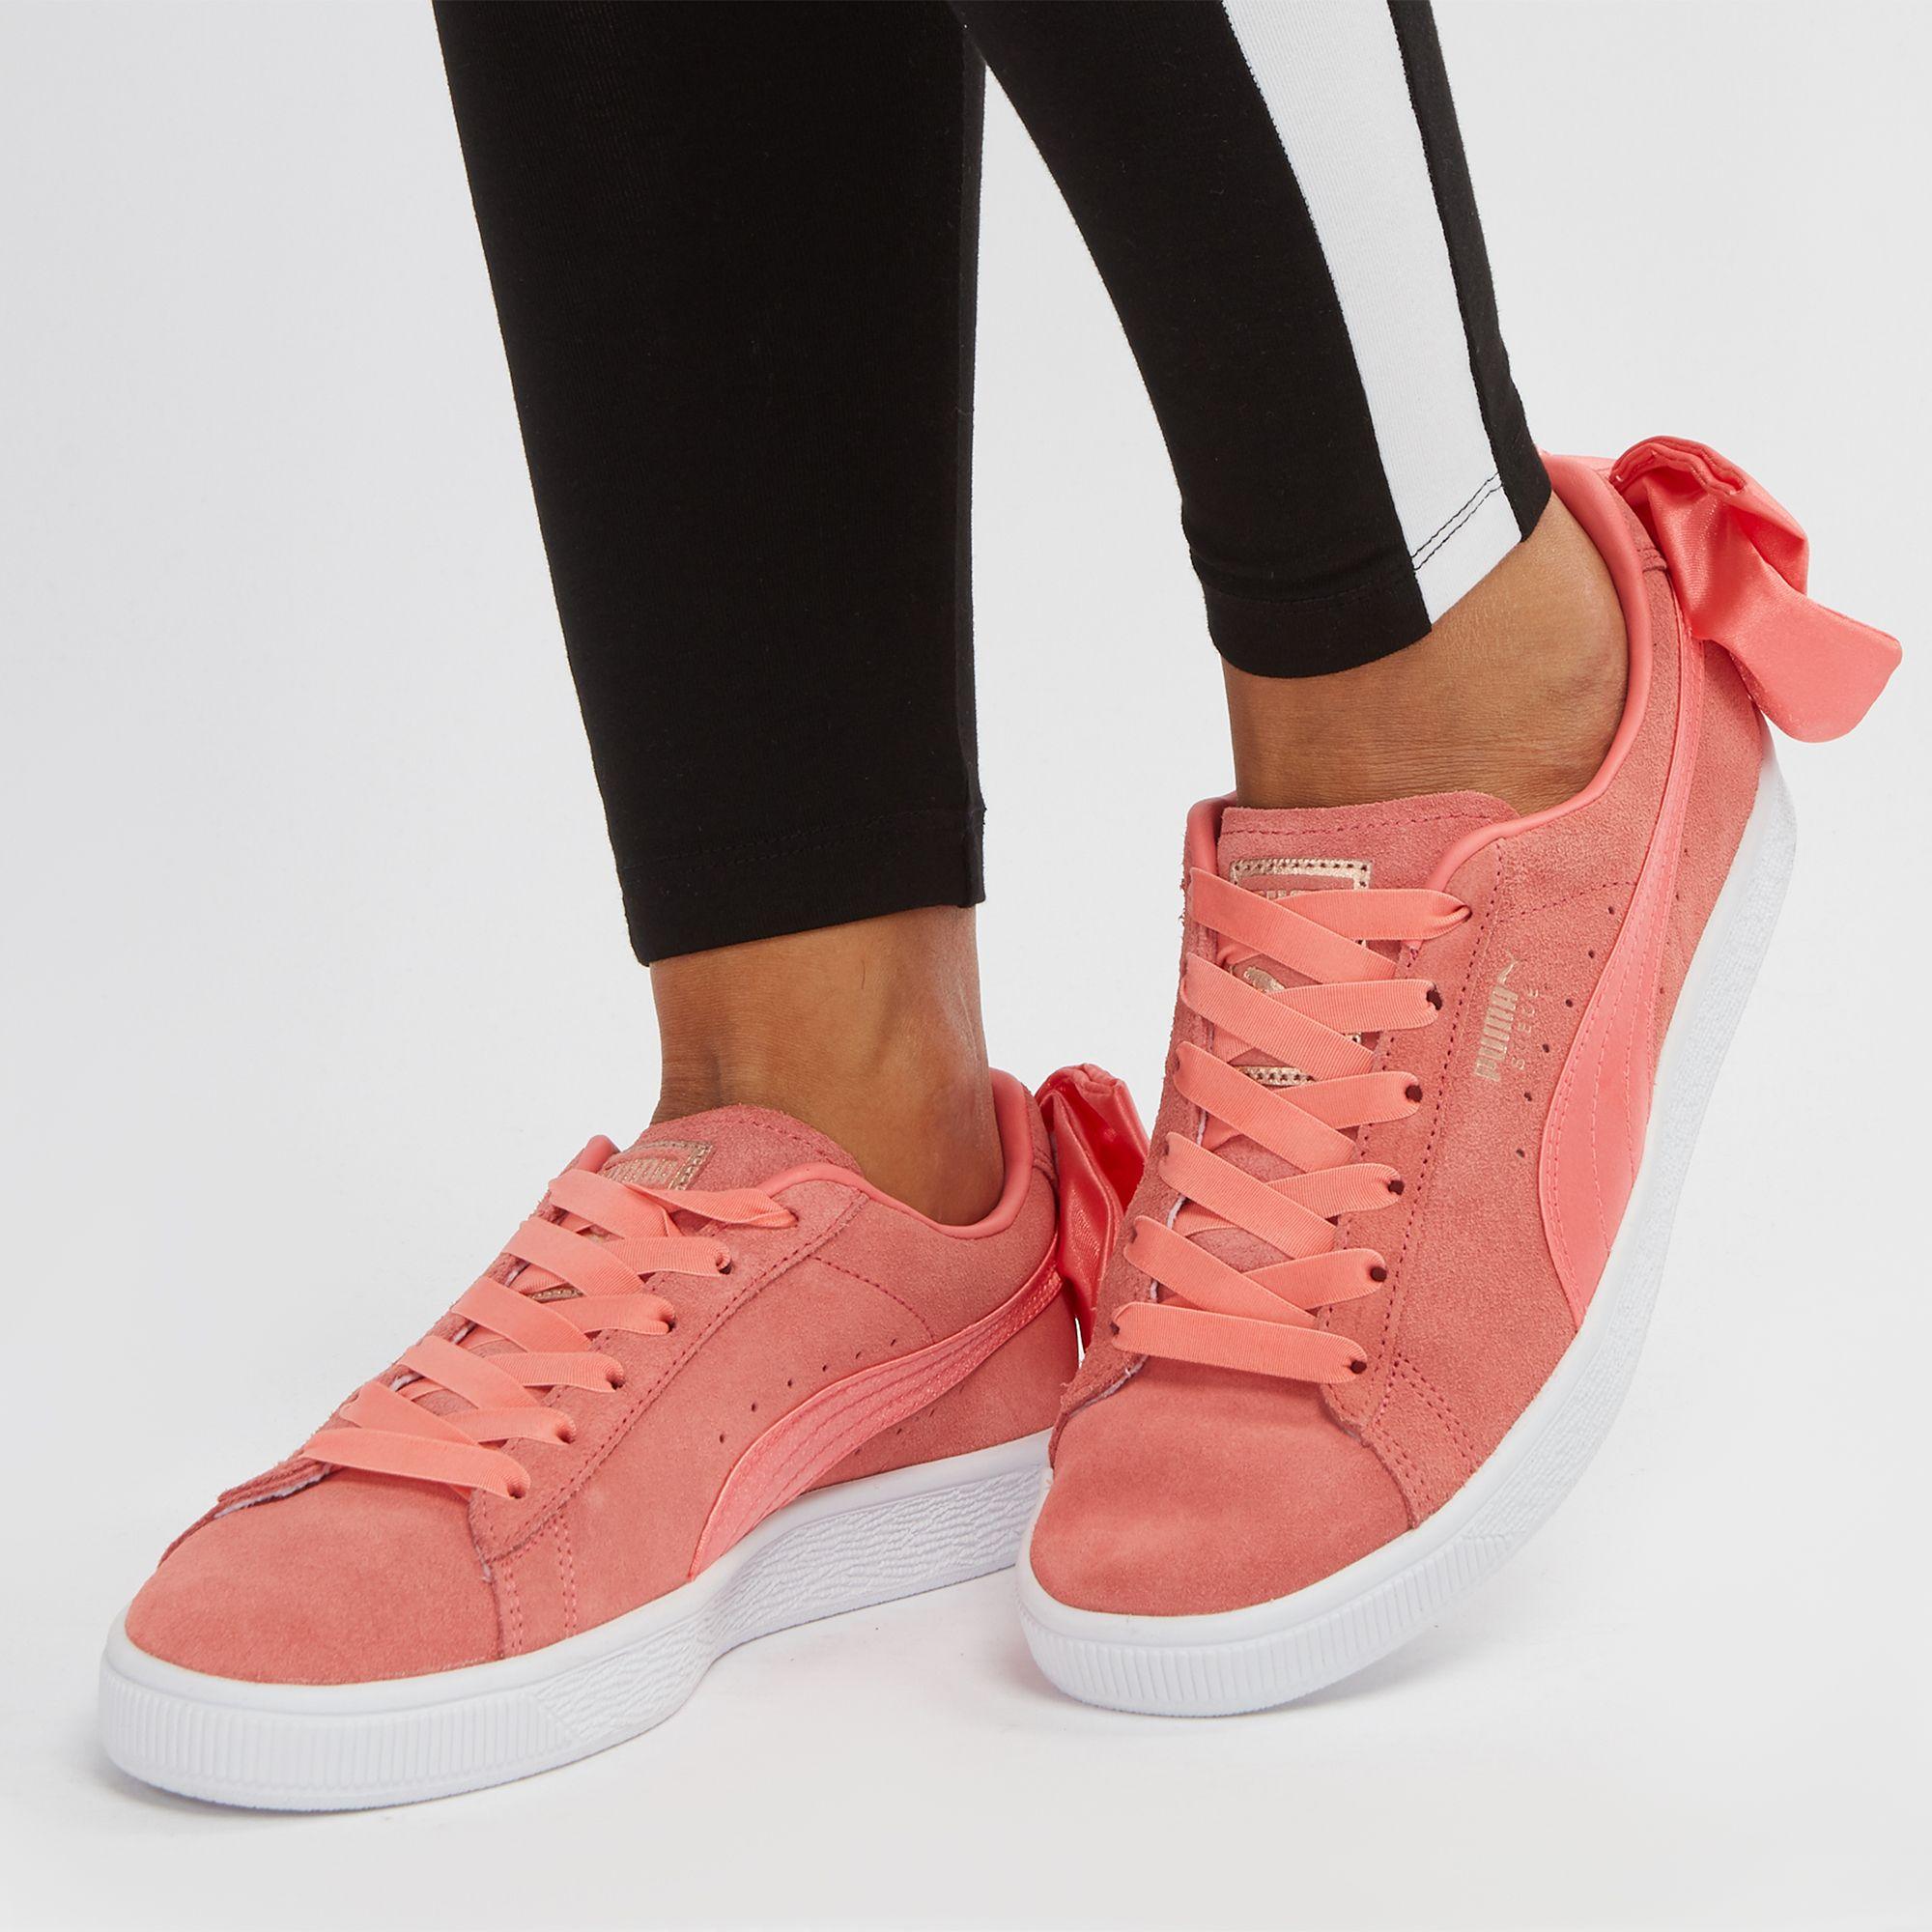 d8b4024fff7 PUMA Suede Bow Shoe - Pink